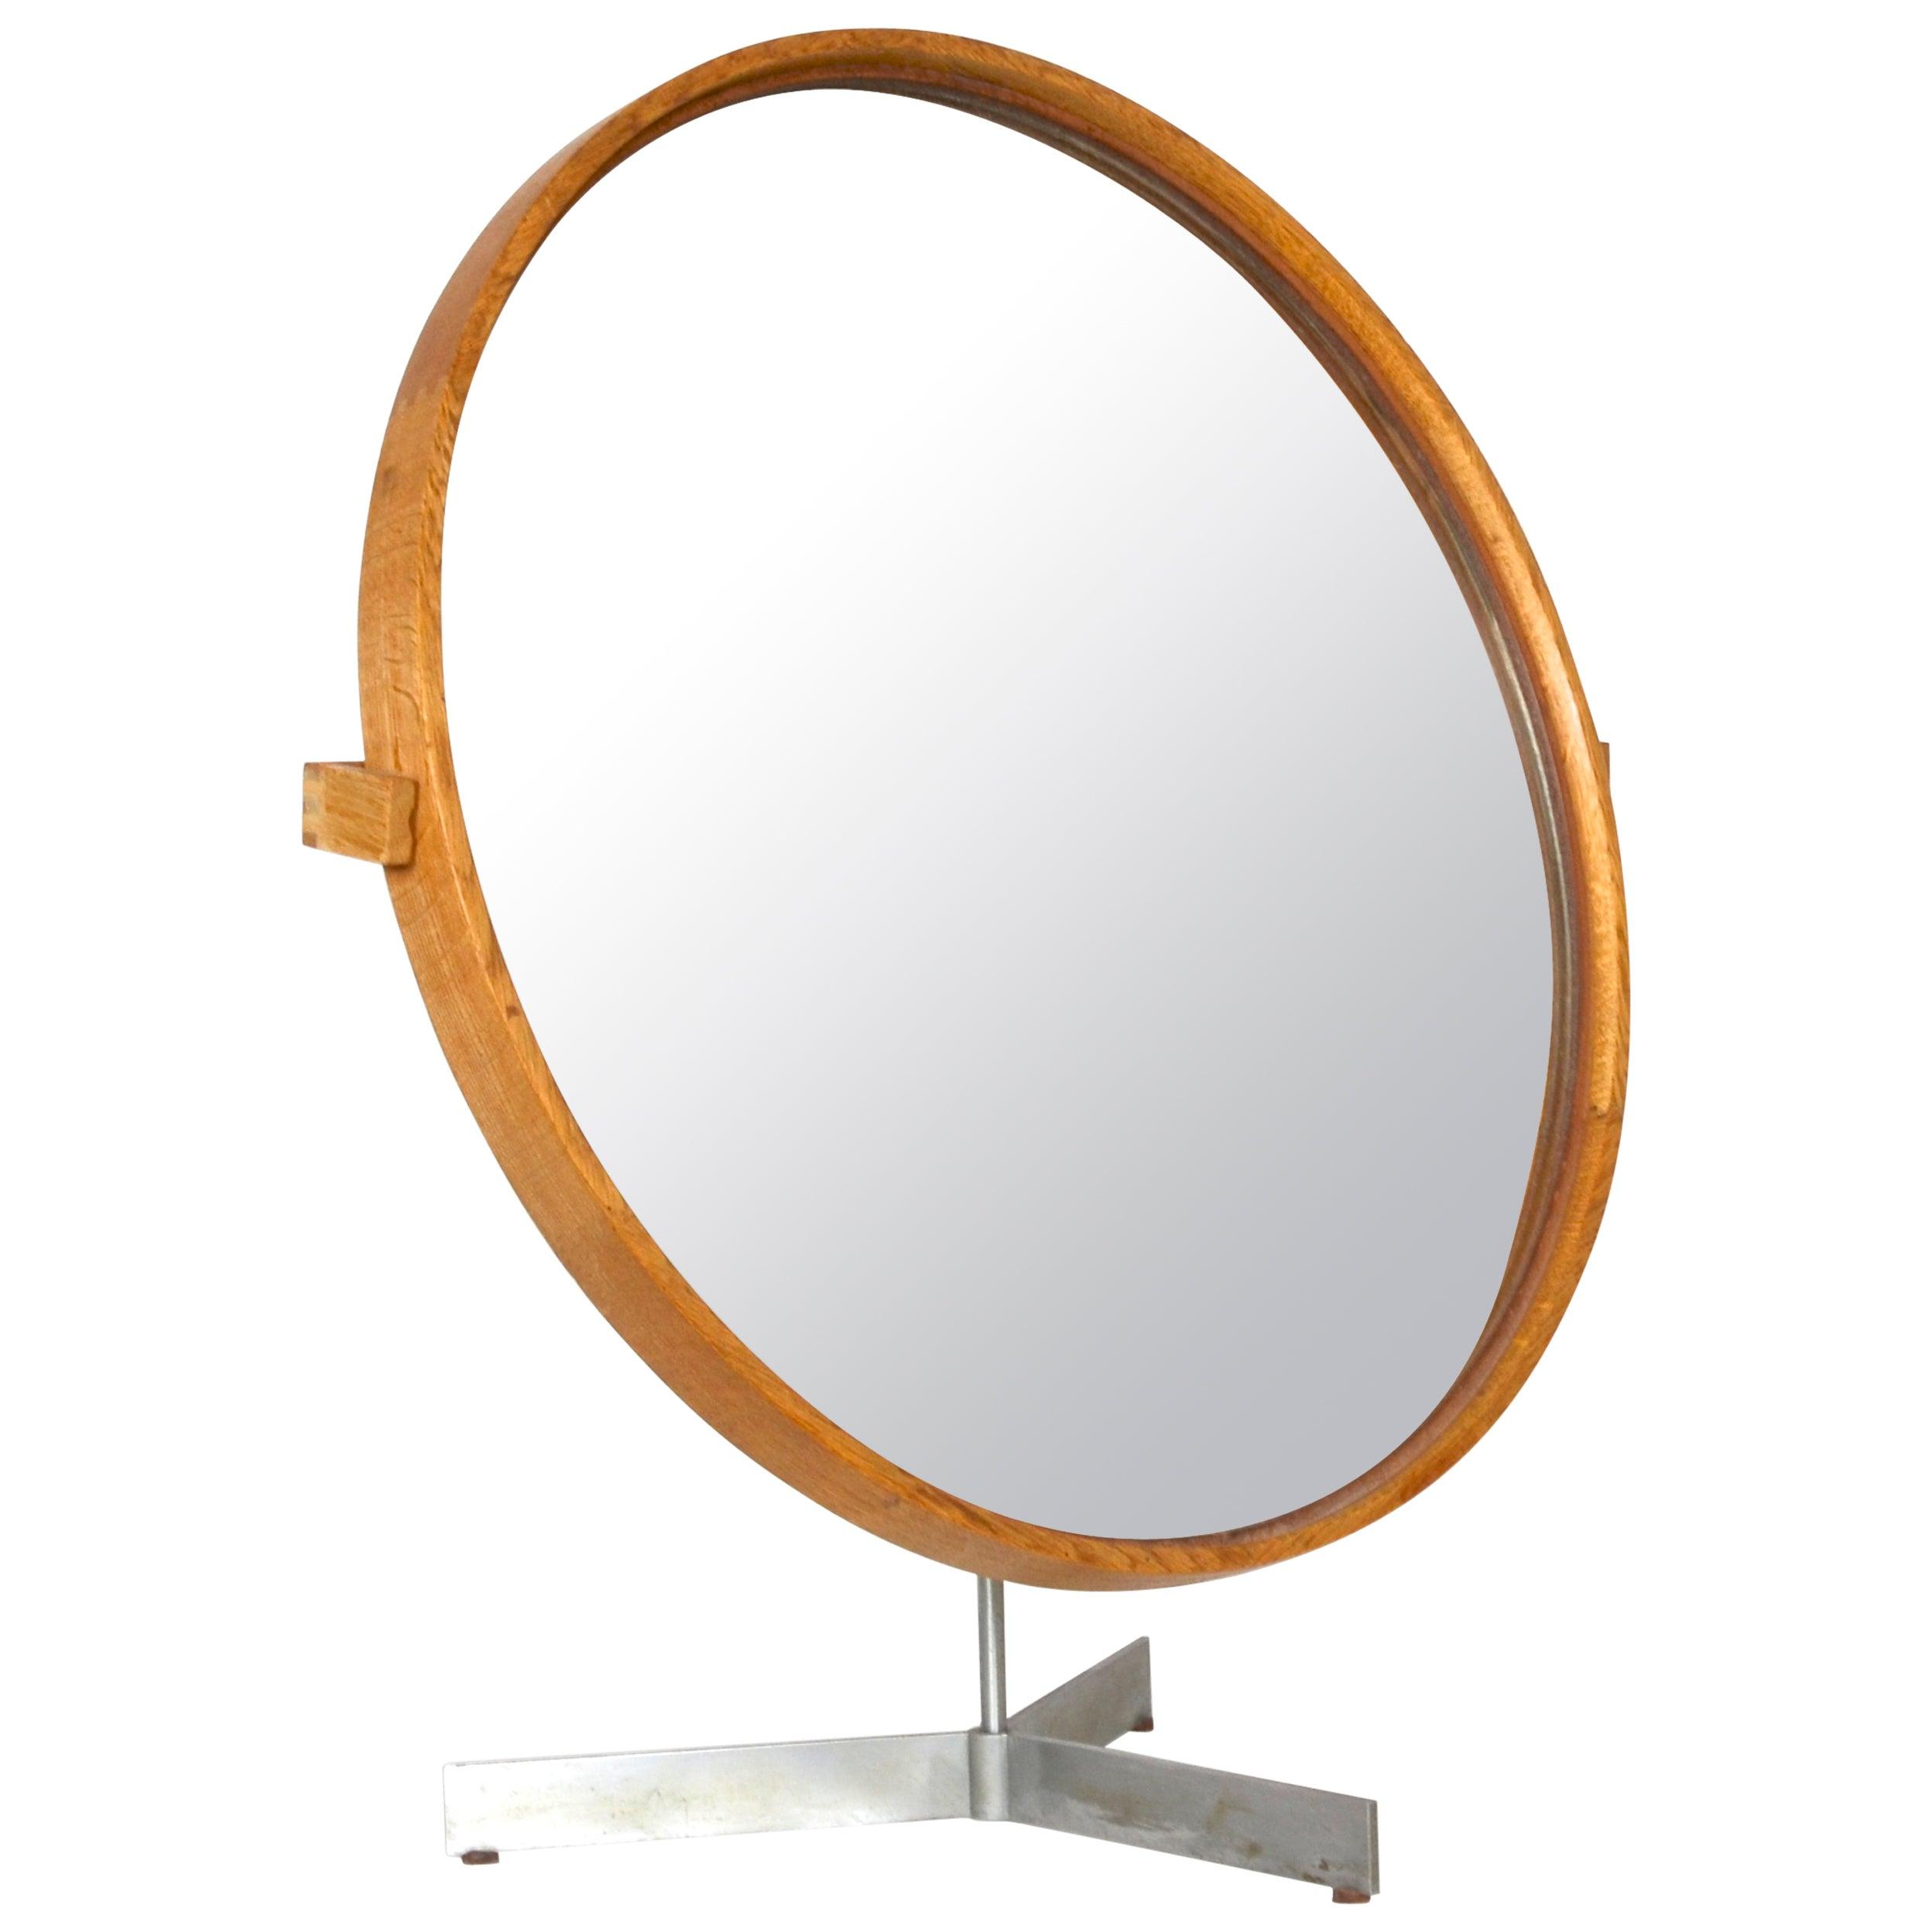 Table Mirror by Uno & Östen Kristiansson for Luxus of Sweden, 1960s